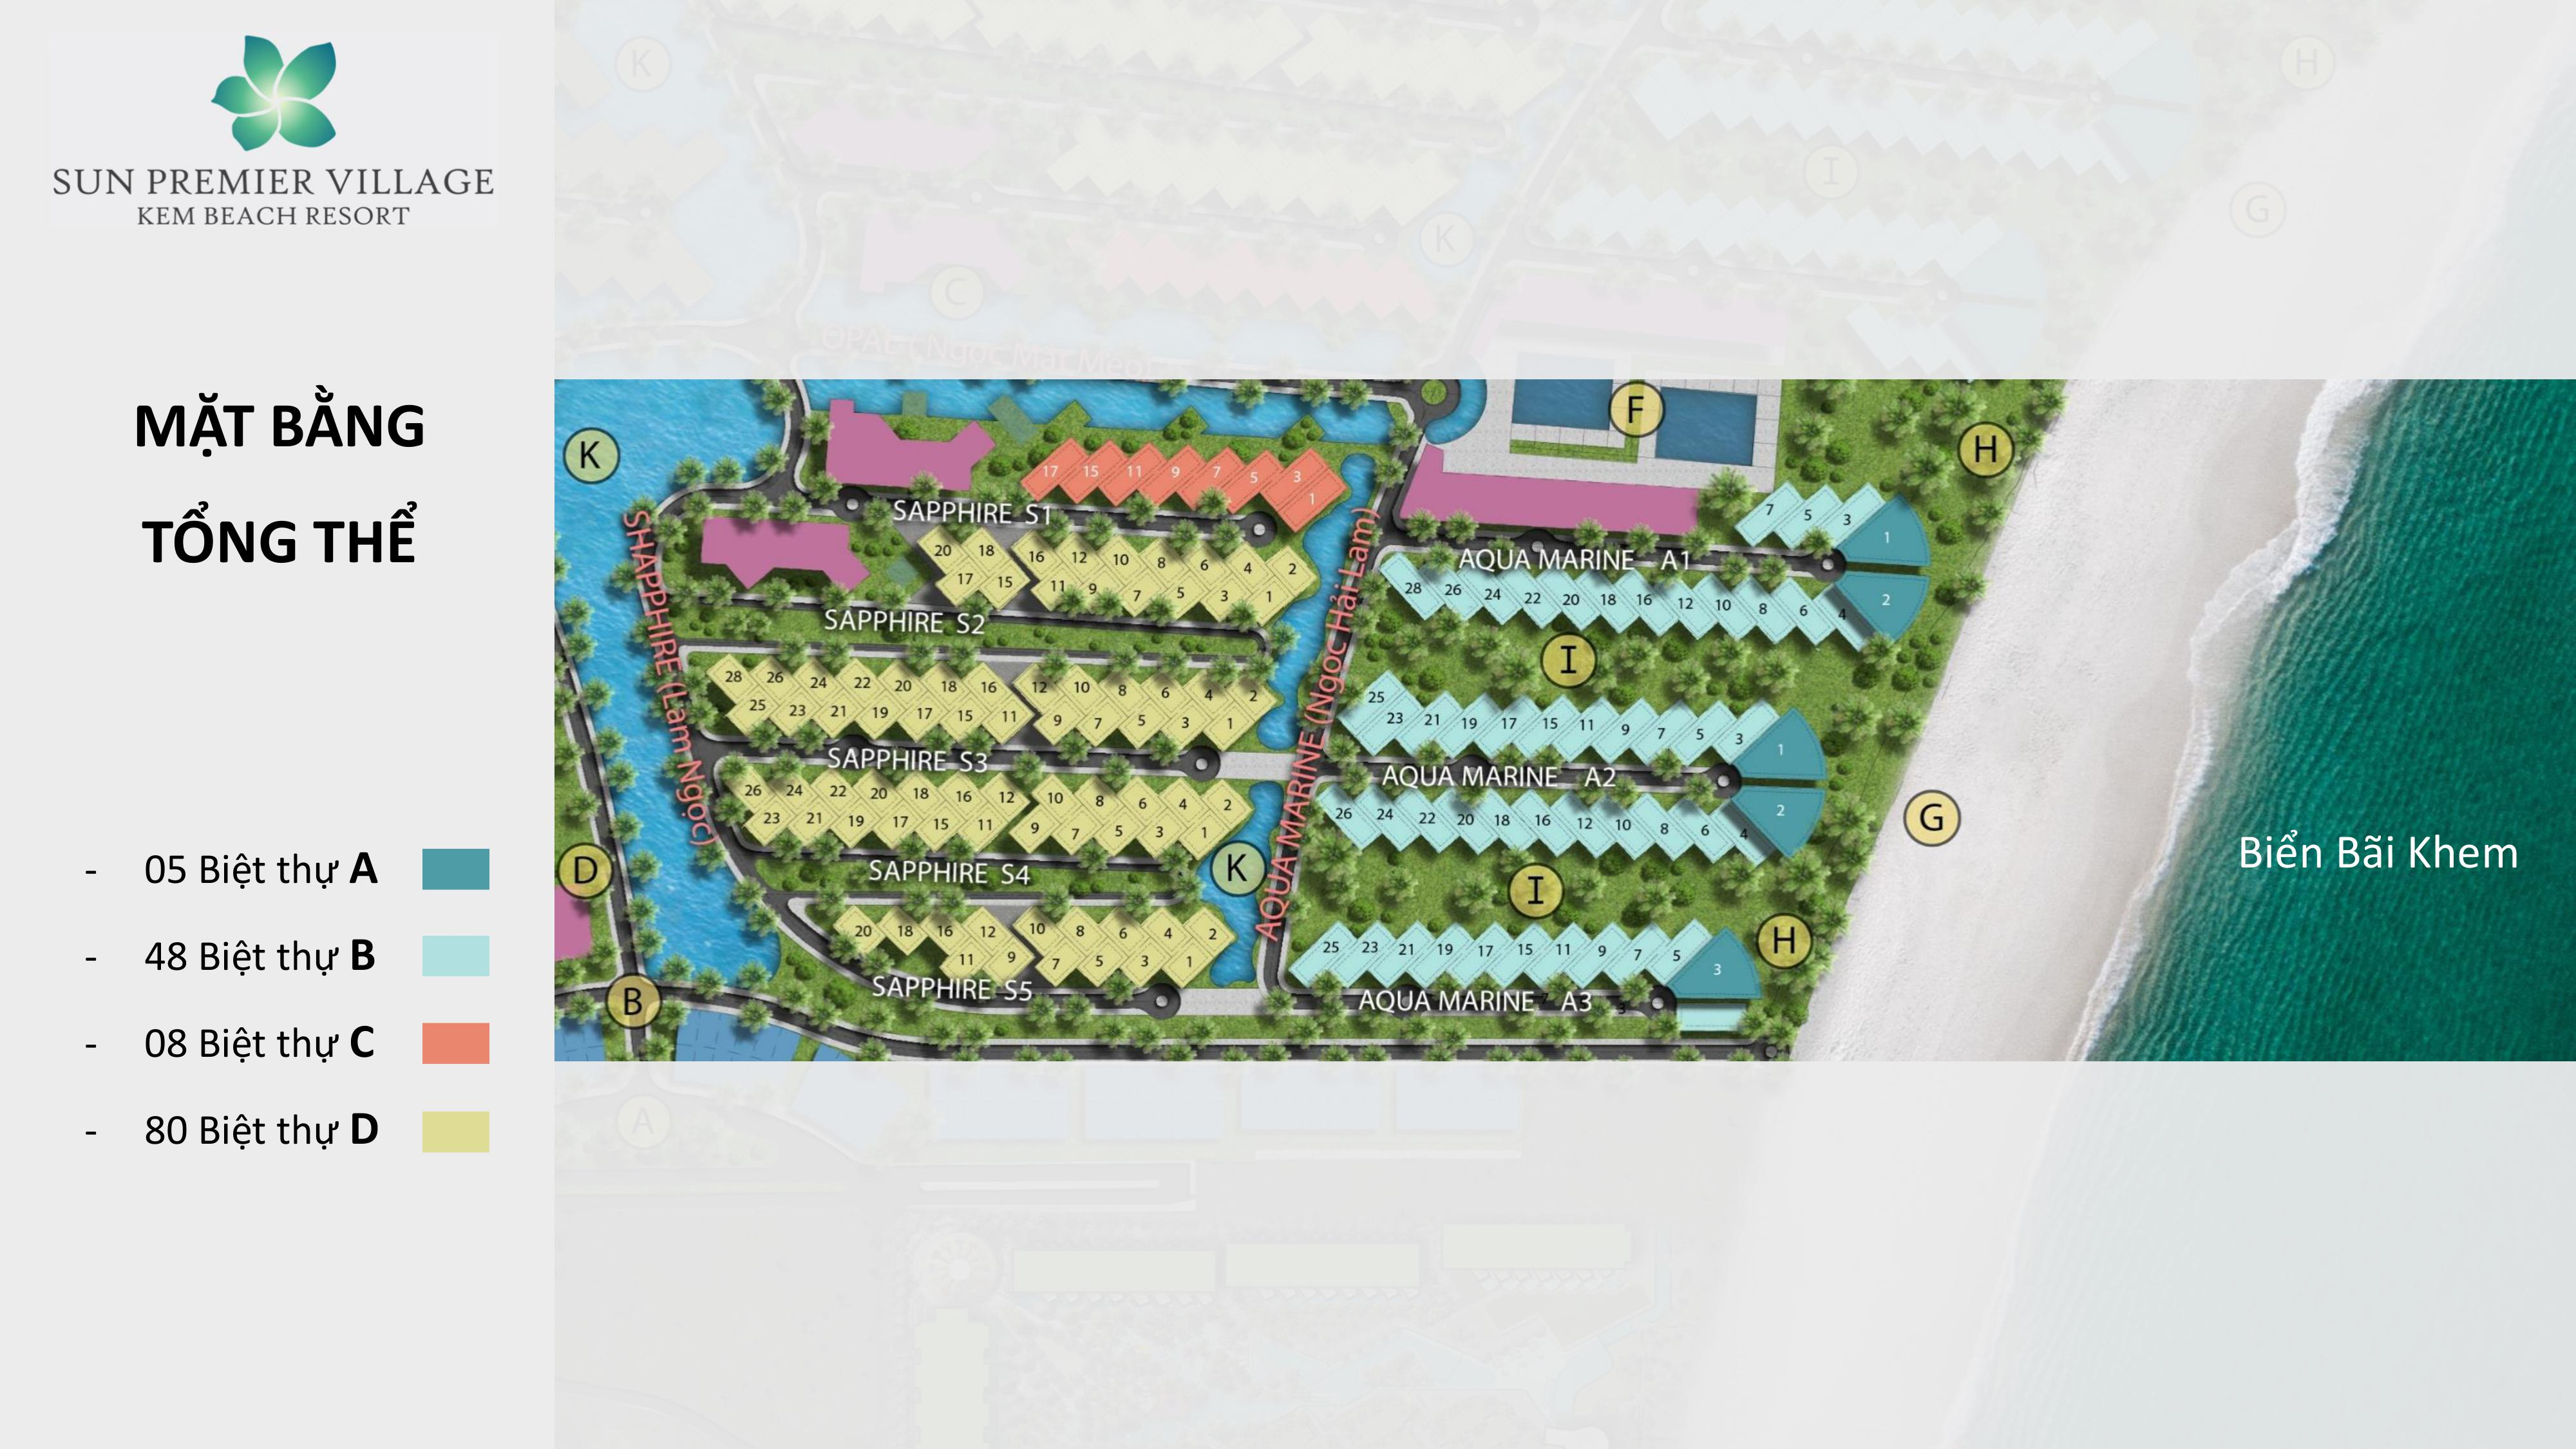 Mặt bằng tổng thế Sun Premier Village Kem Beach Resort